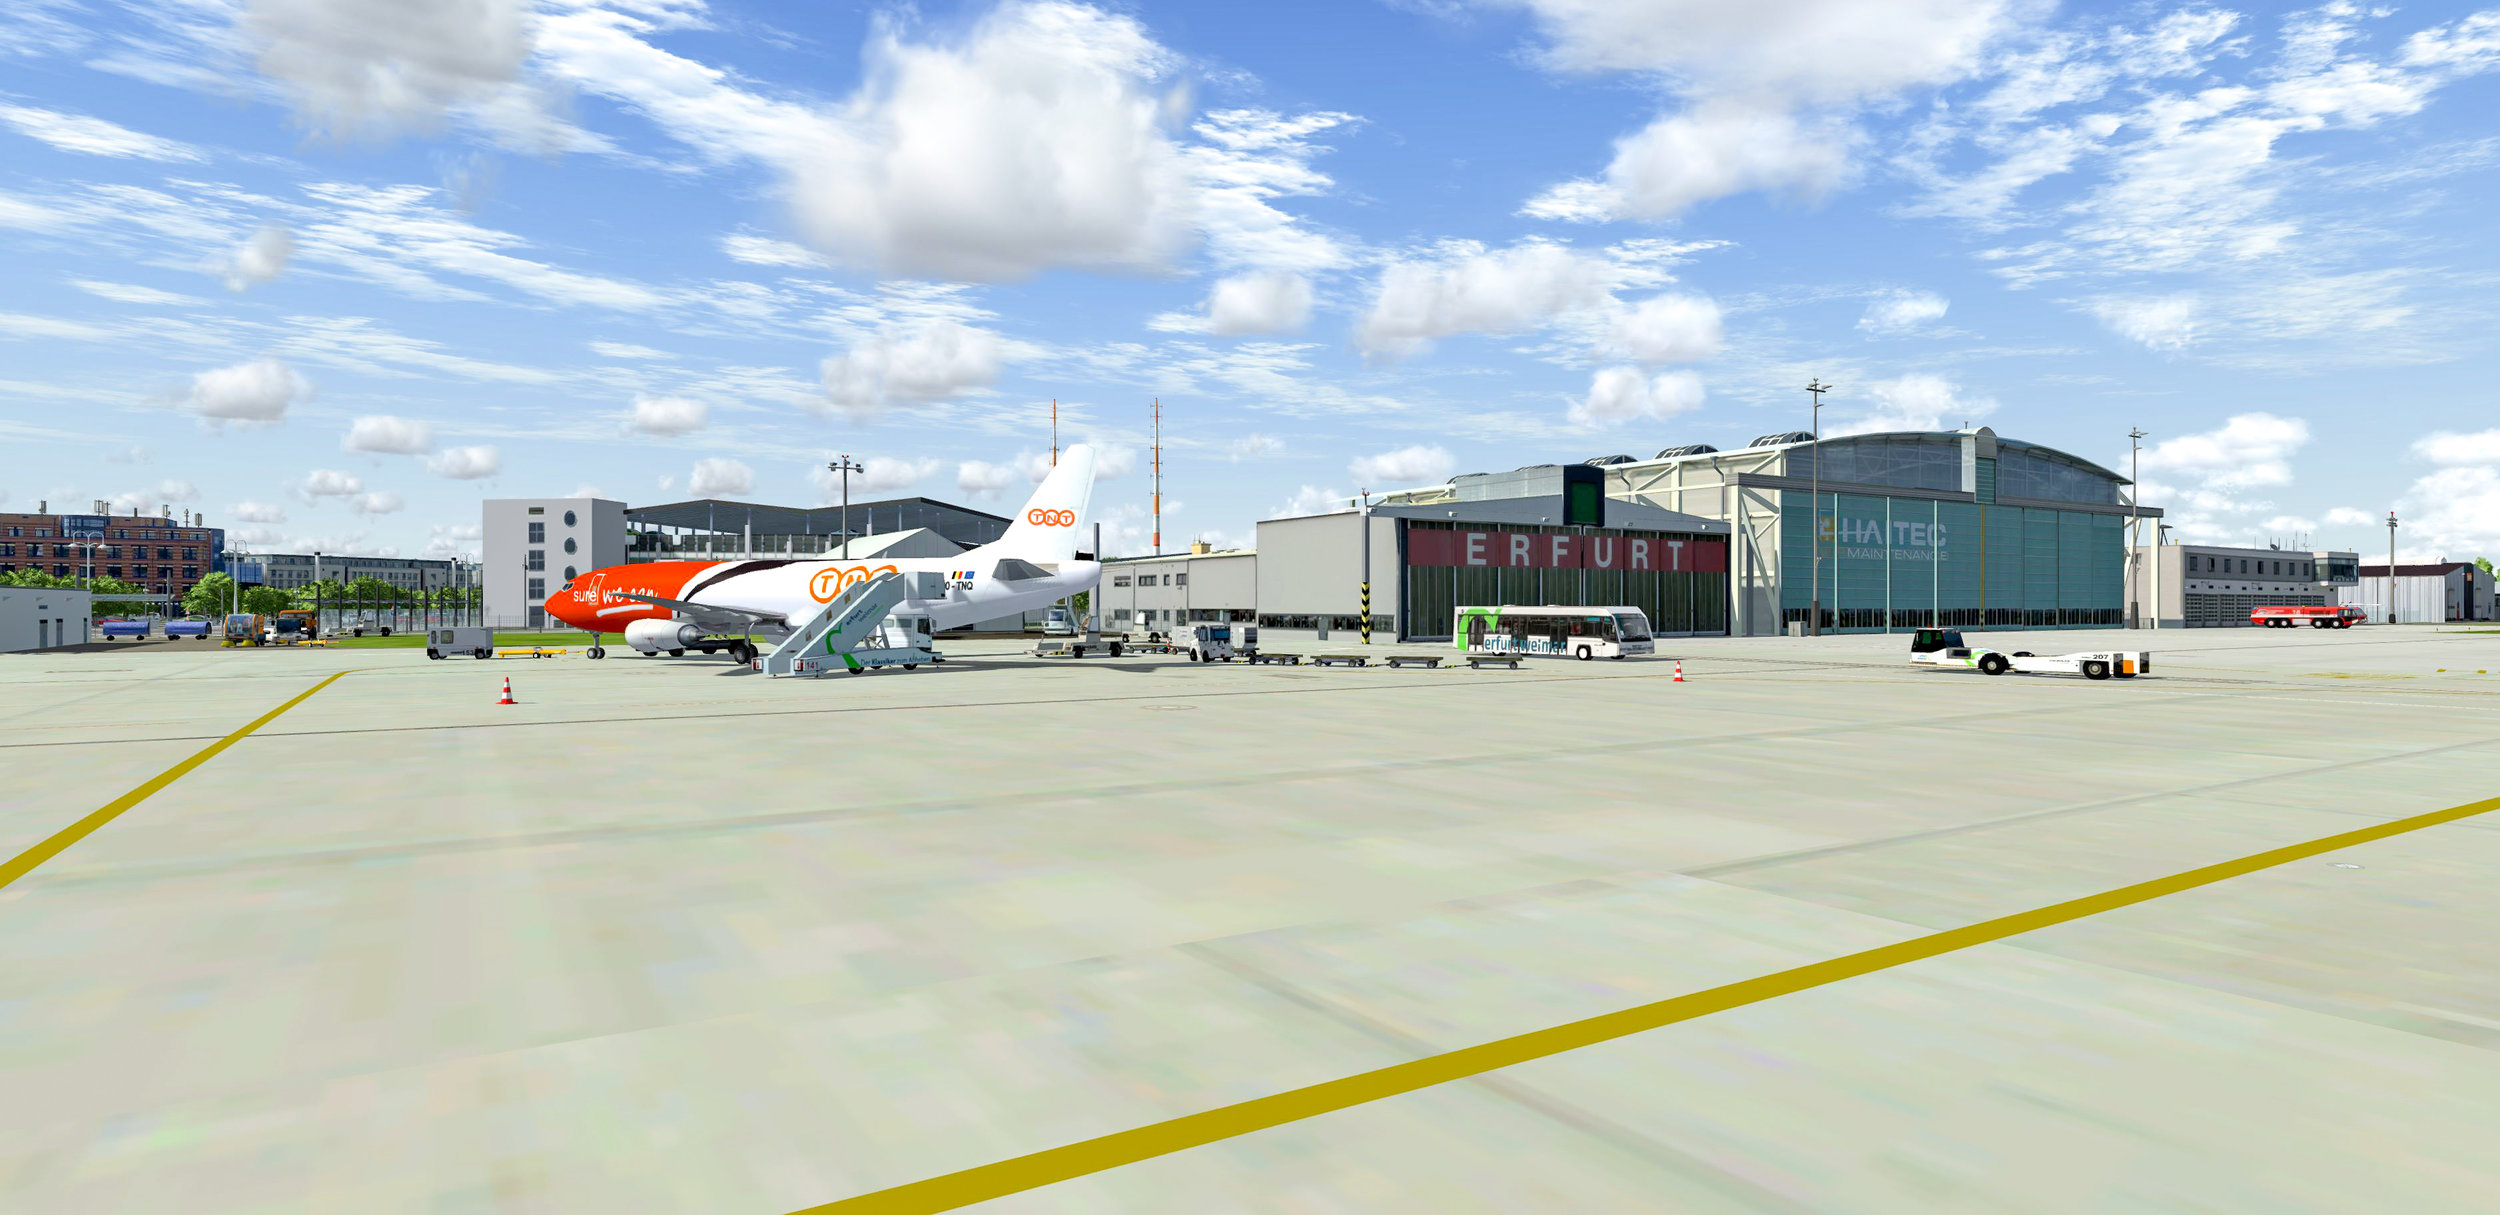 Airport_Erfurt_P3Dv4_08.jpg